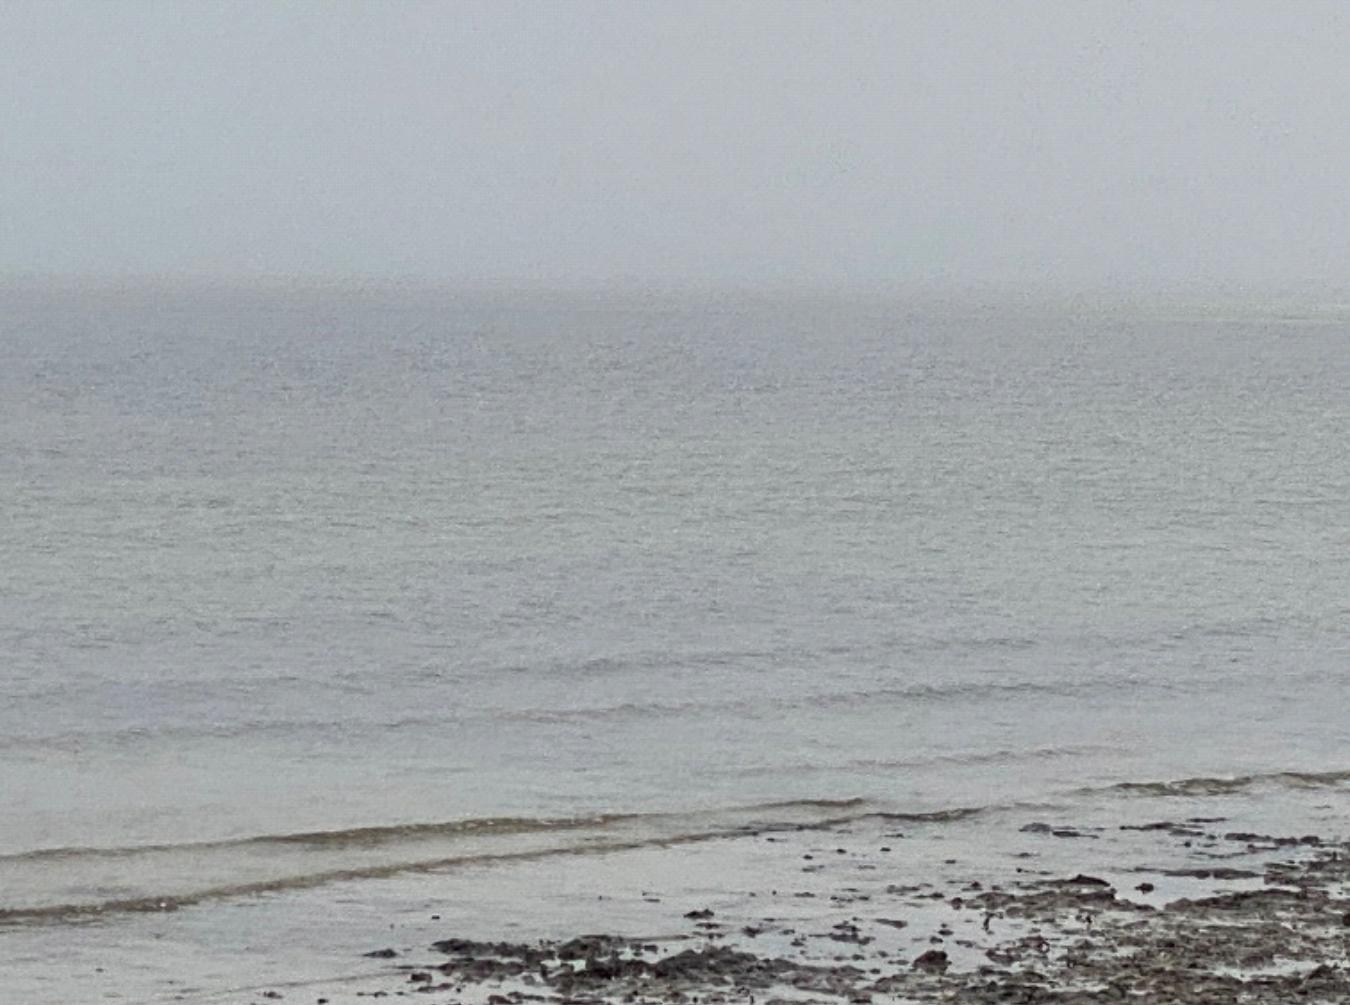 a gray, foggy ocean scene